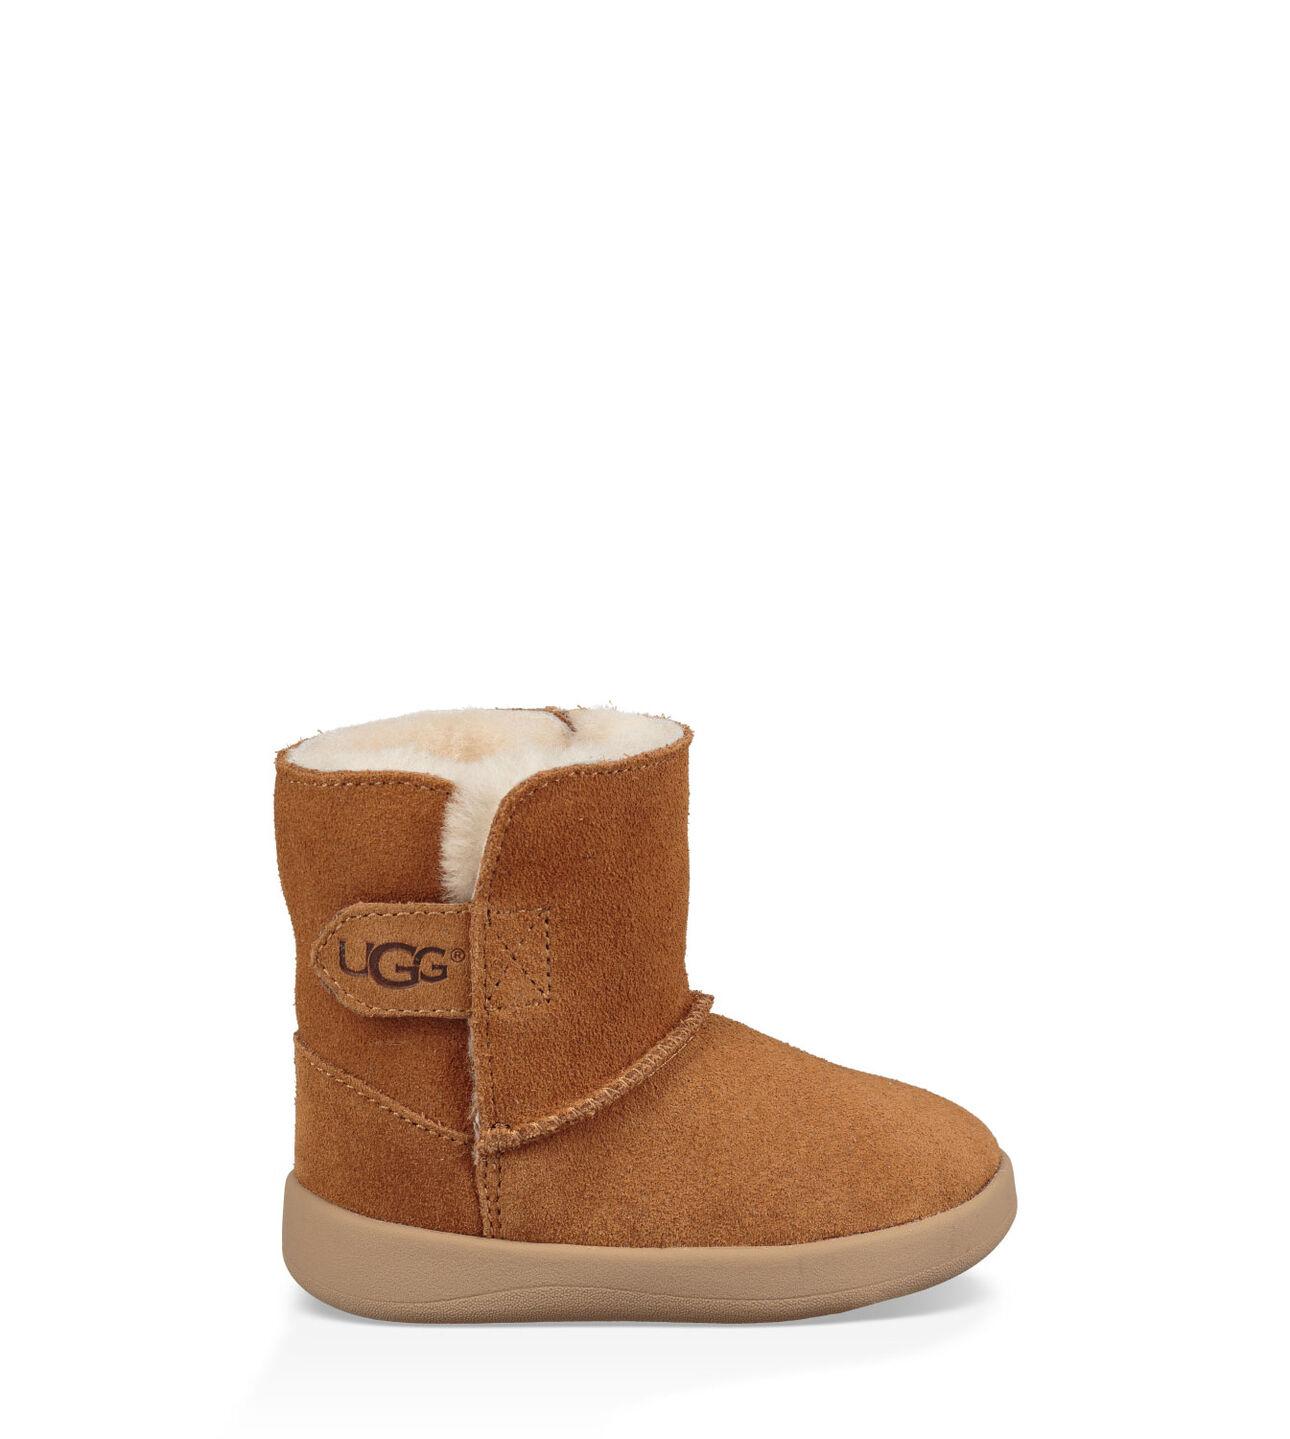 genuine ugg boots reviews